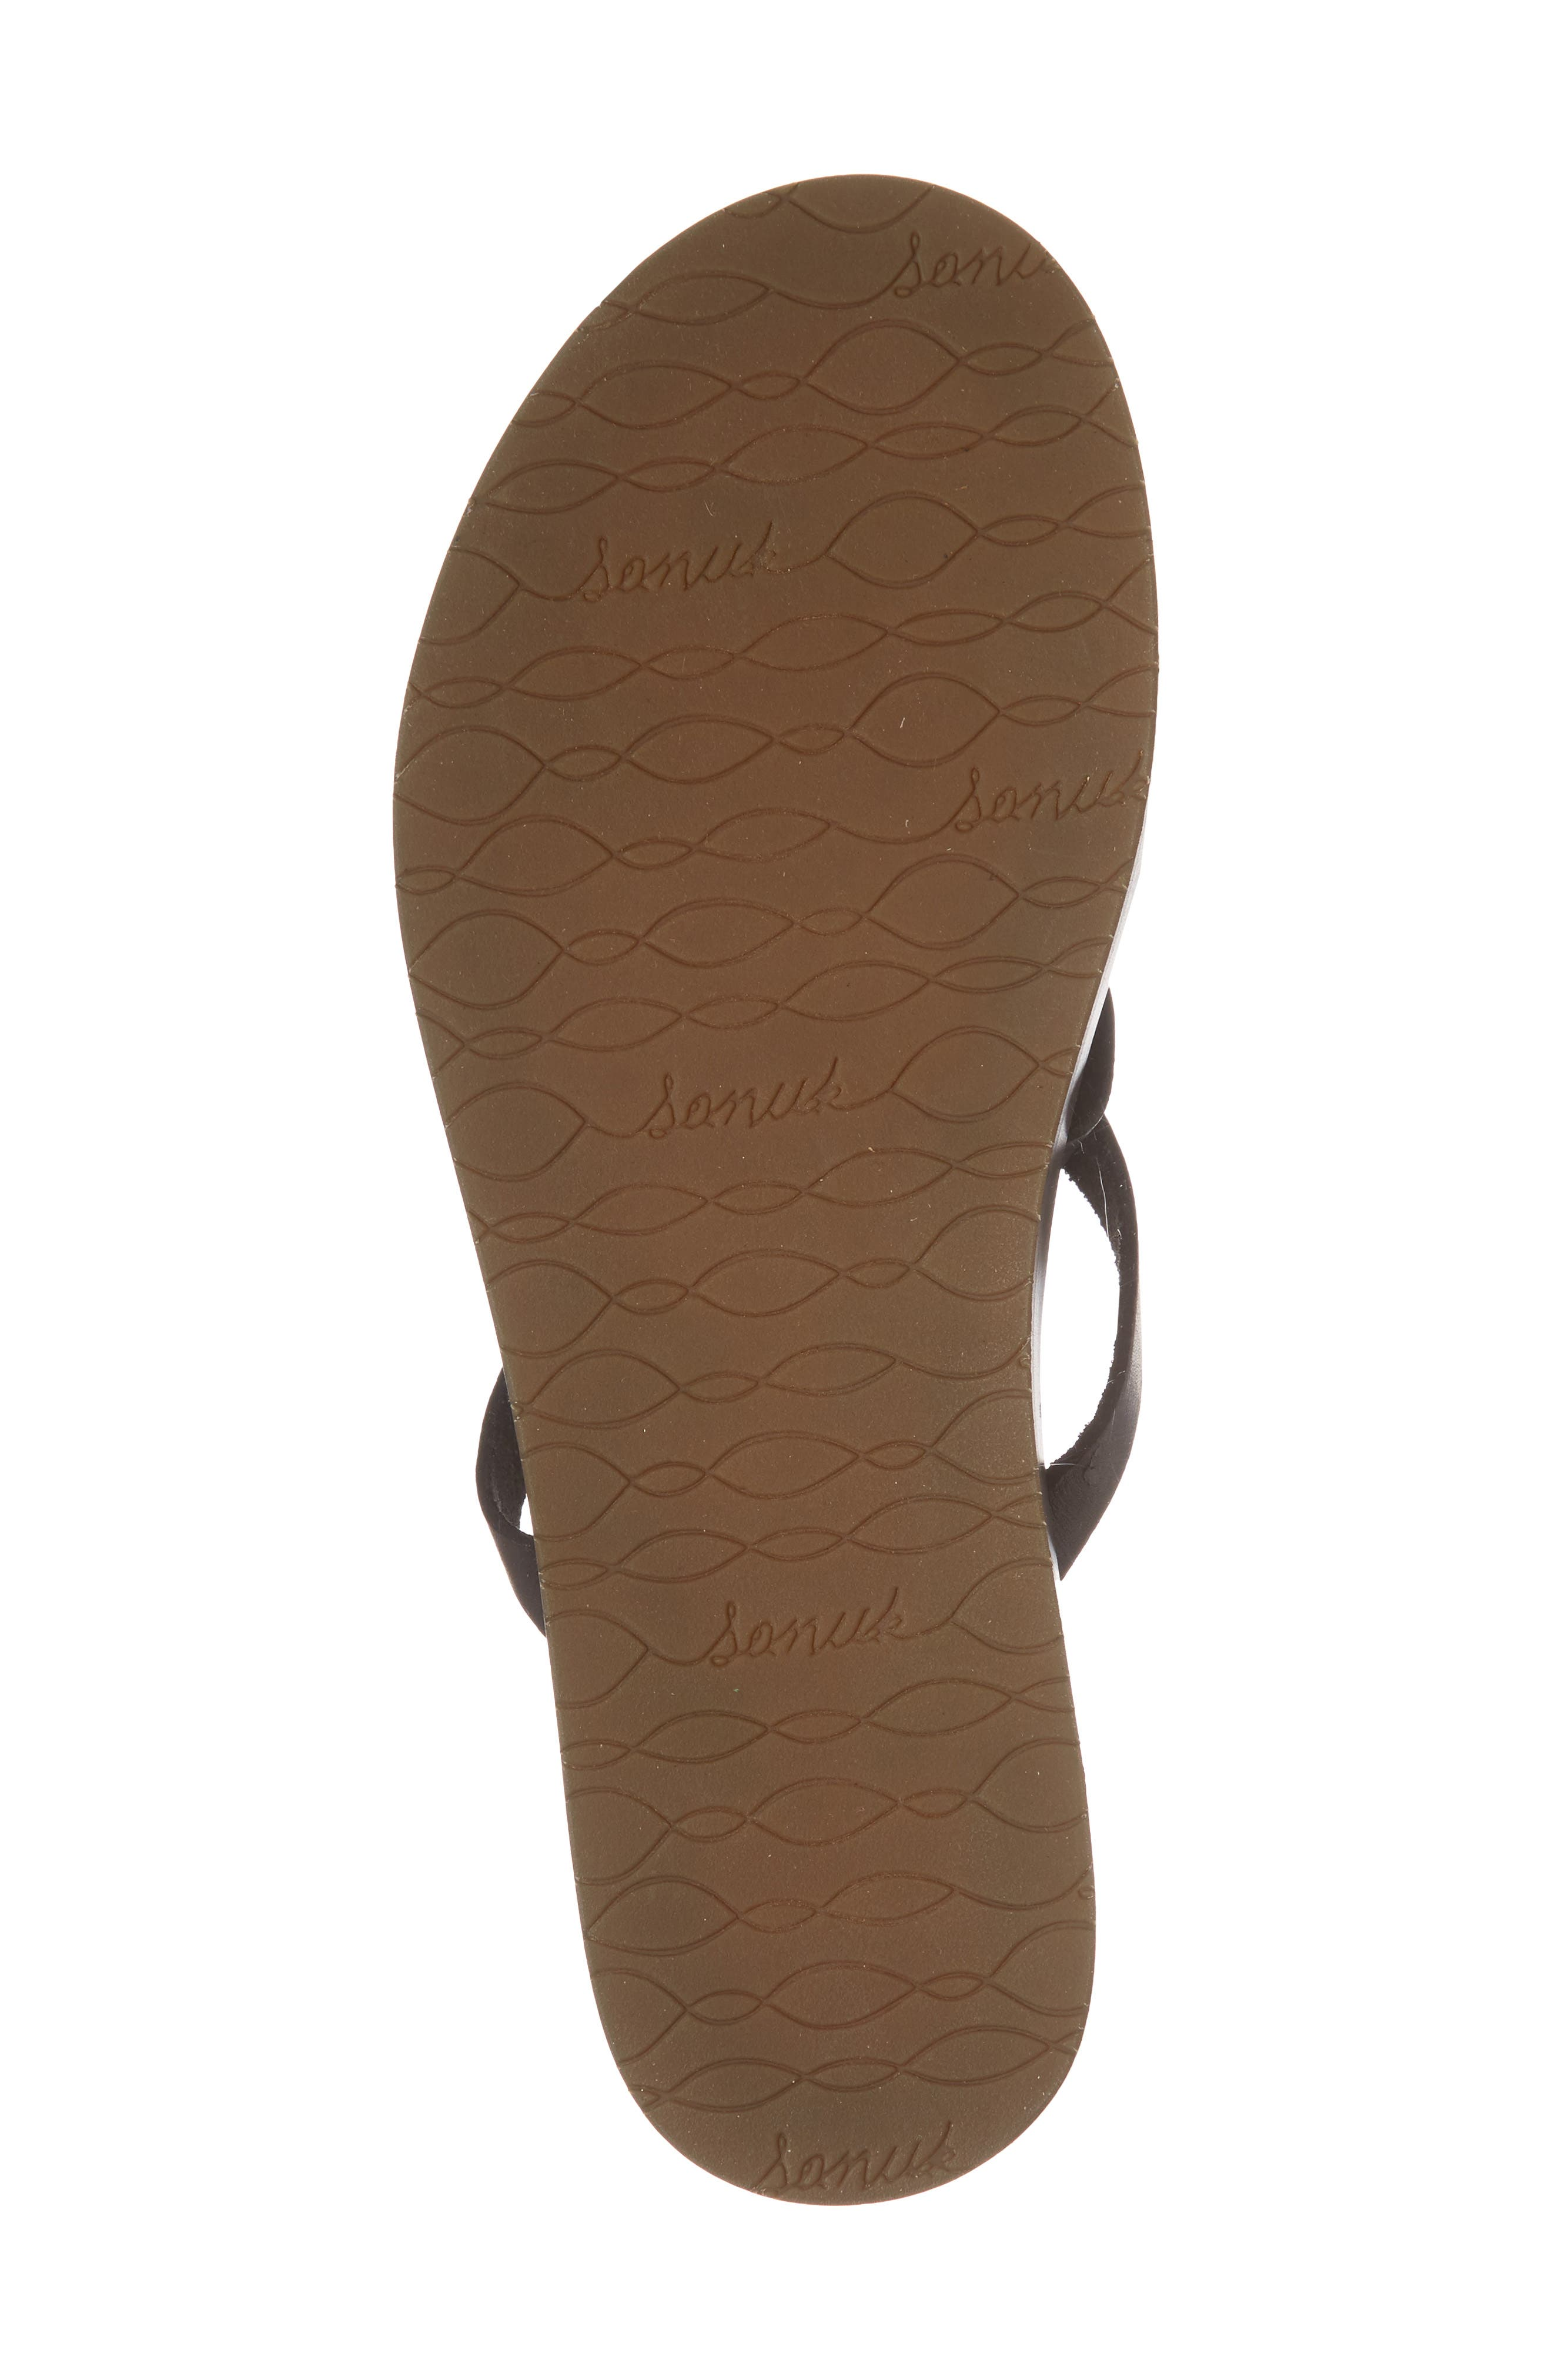 Yoga Strappy Thong Sandal,                             Alternate thumbnail 6, color,                             001